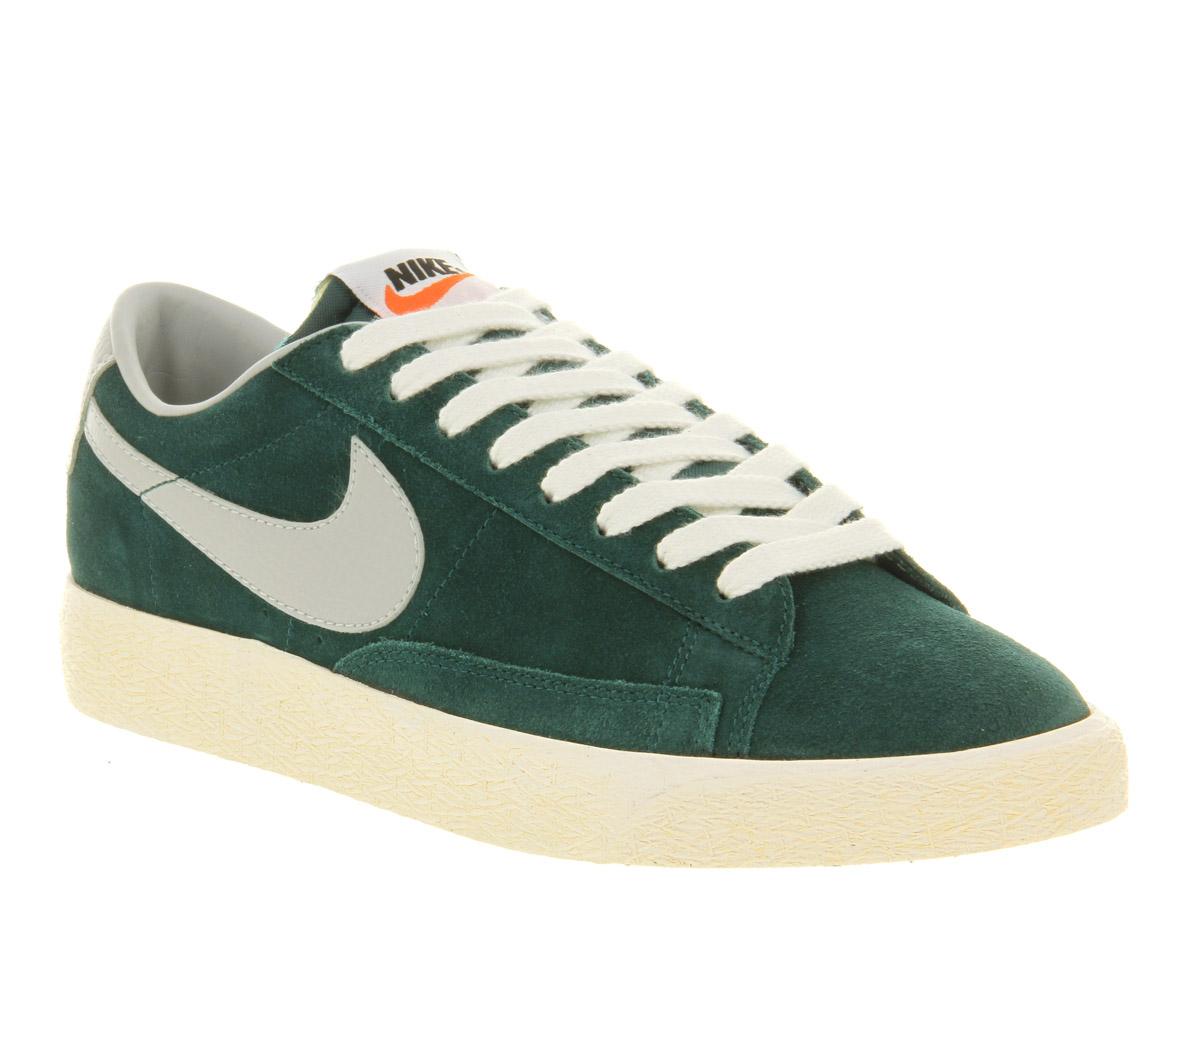 Nike Blazer Low Vintage Dark Atomic Strata Grey in Green for